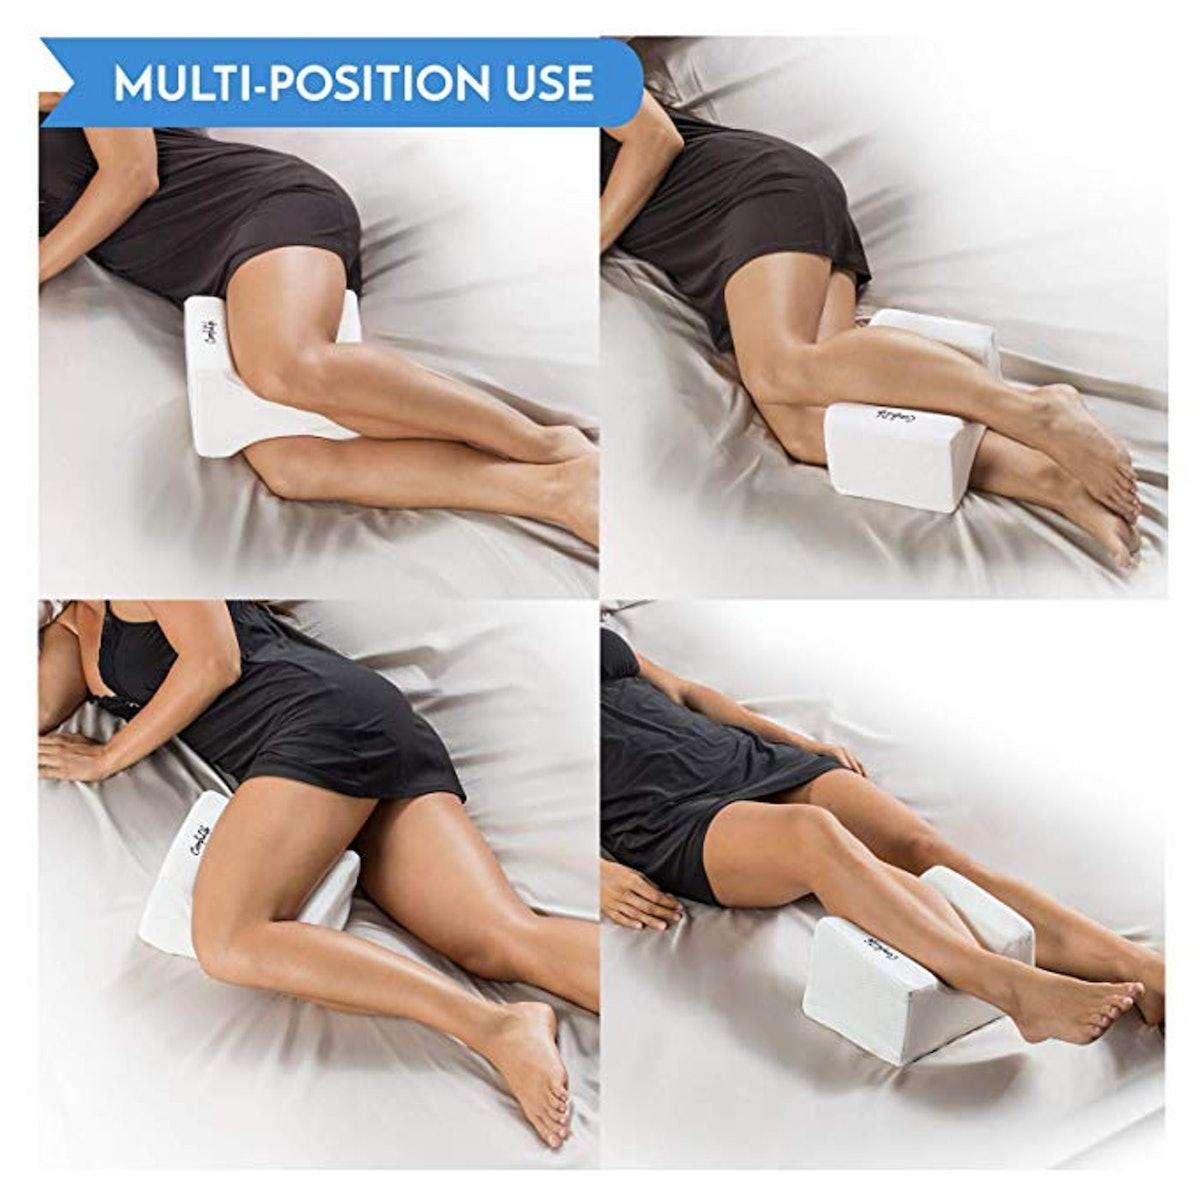 ComfiLife Orthopedic Knee Pillow for Sciatica Relief